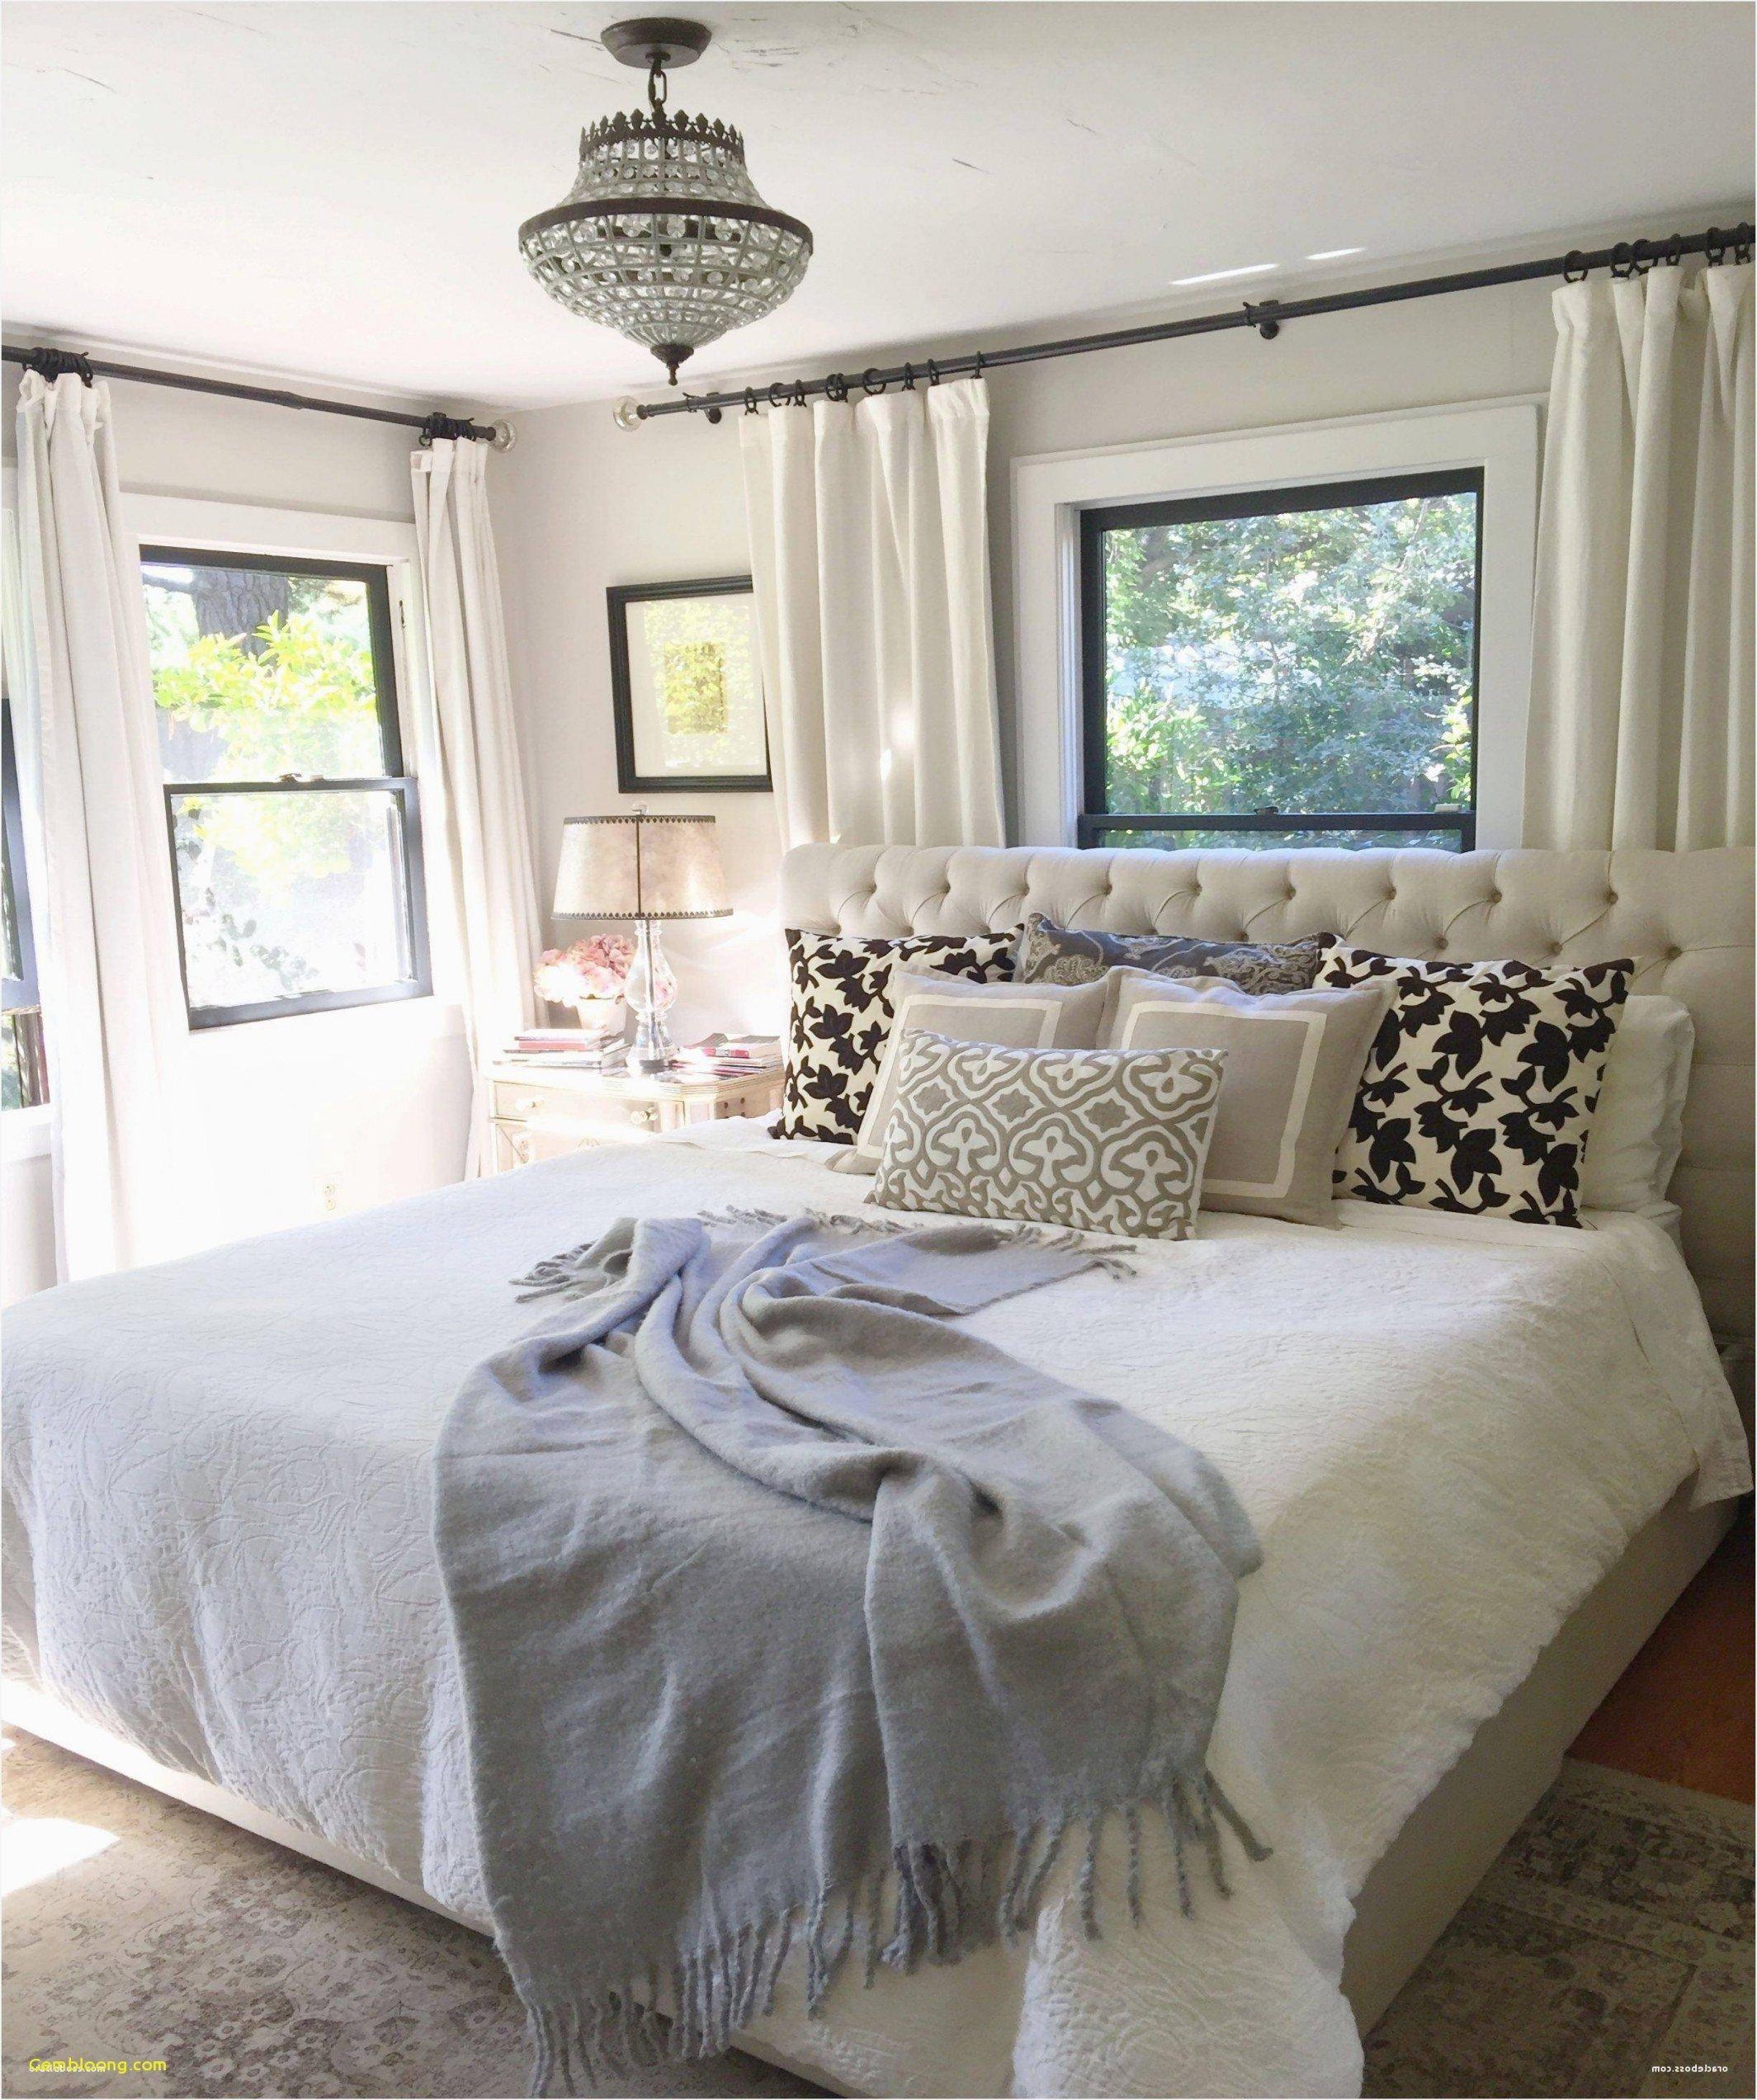 teen girls bedroom ideas 43 lovely teenage girl bedroom ideas cheap of teen girls bedroom ideas 1